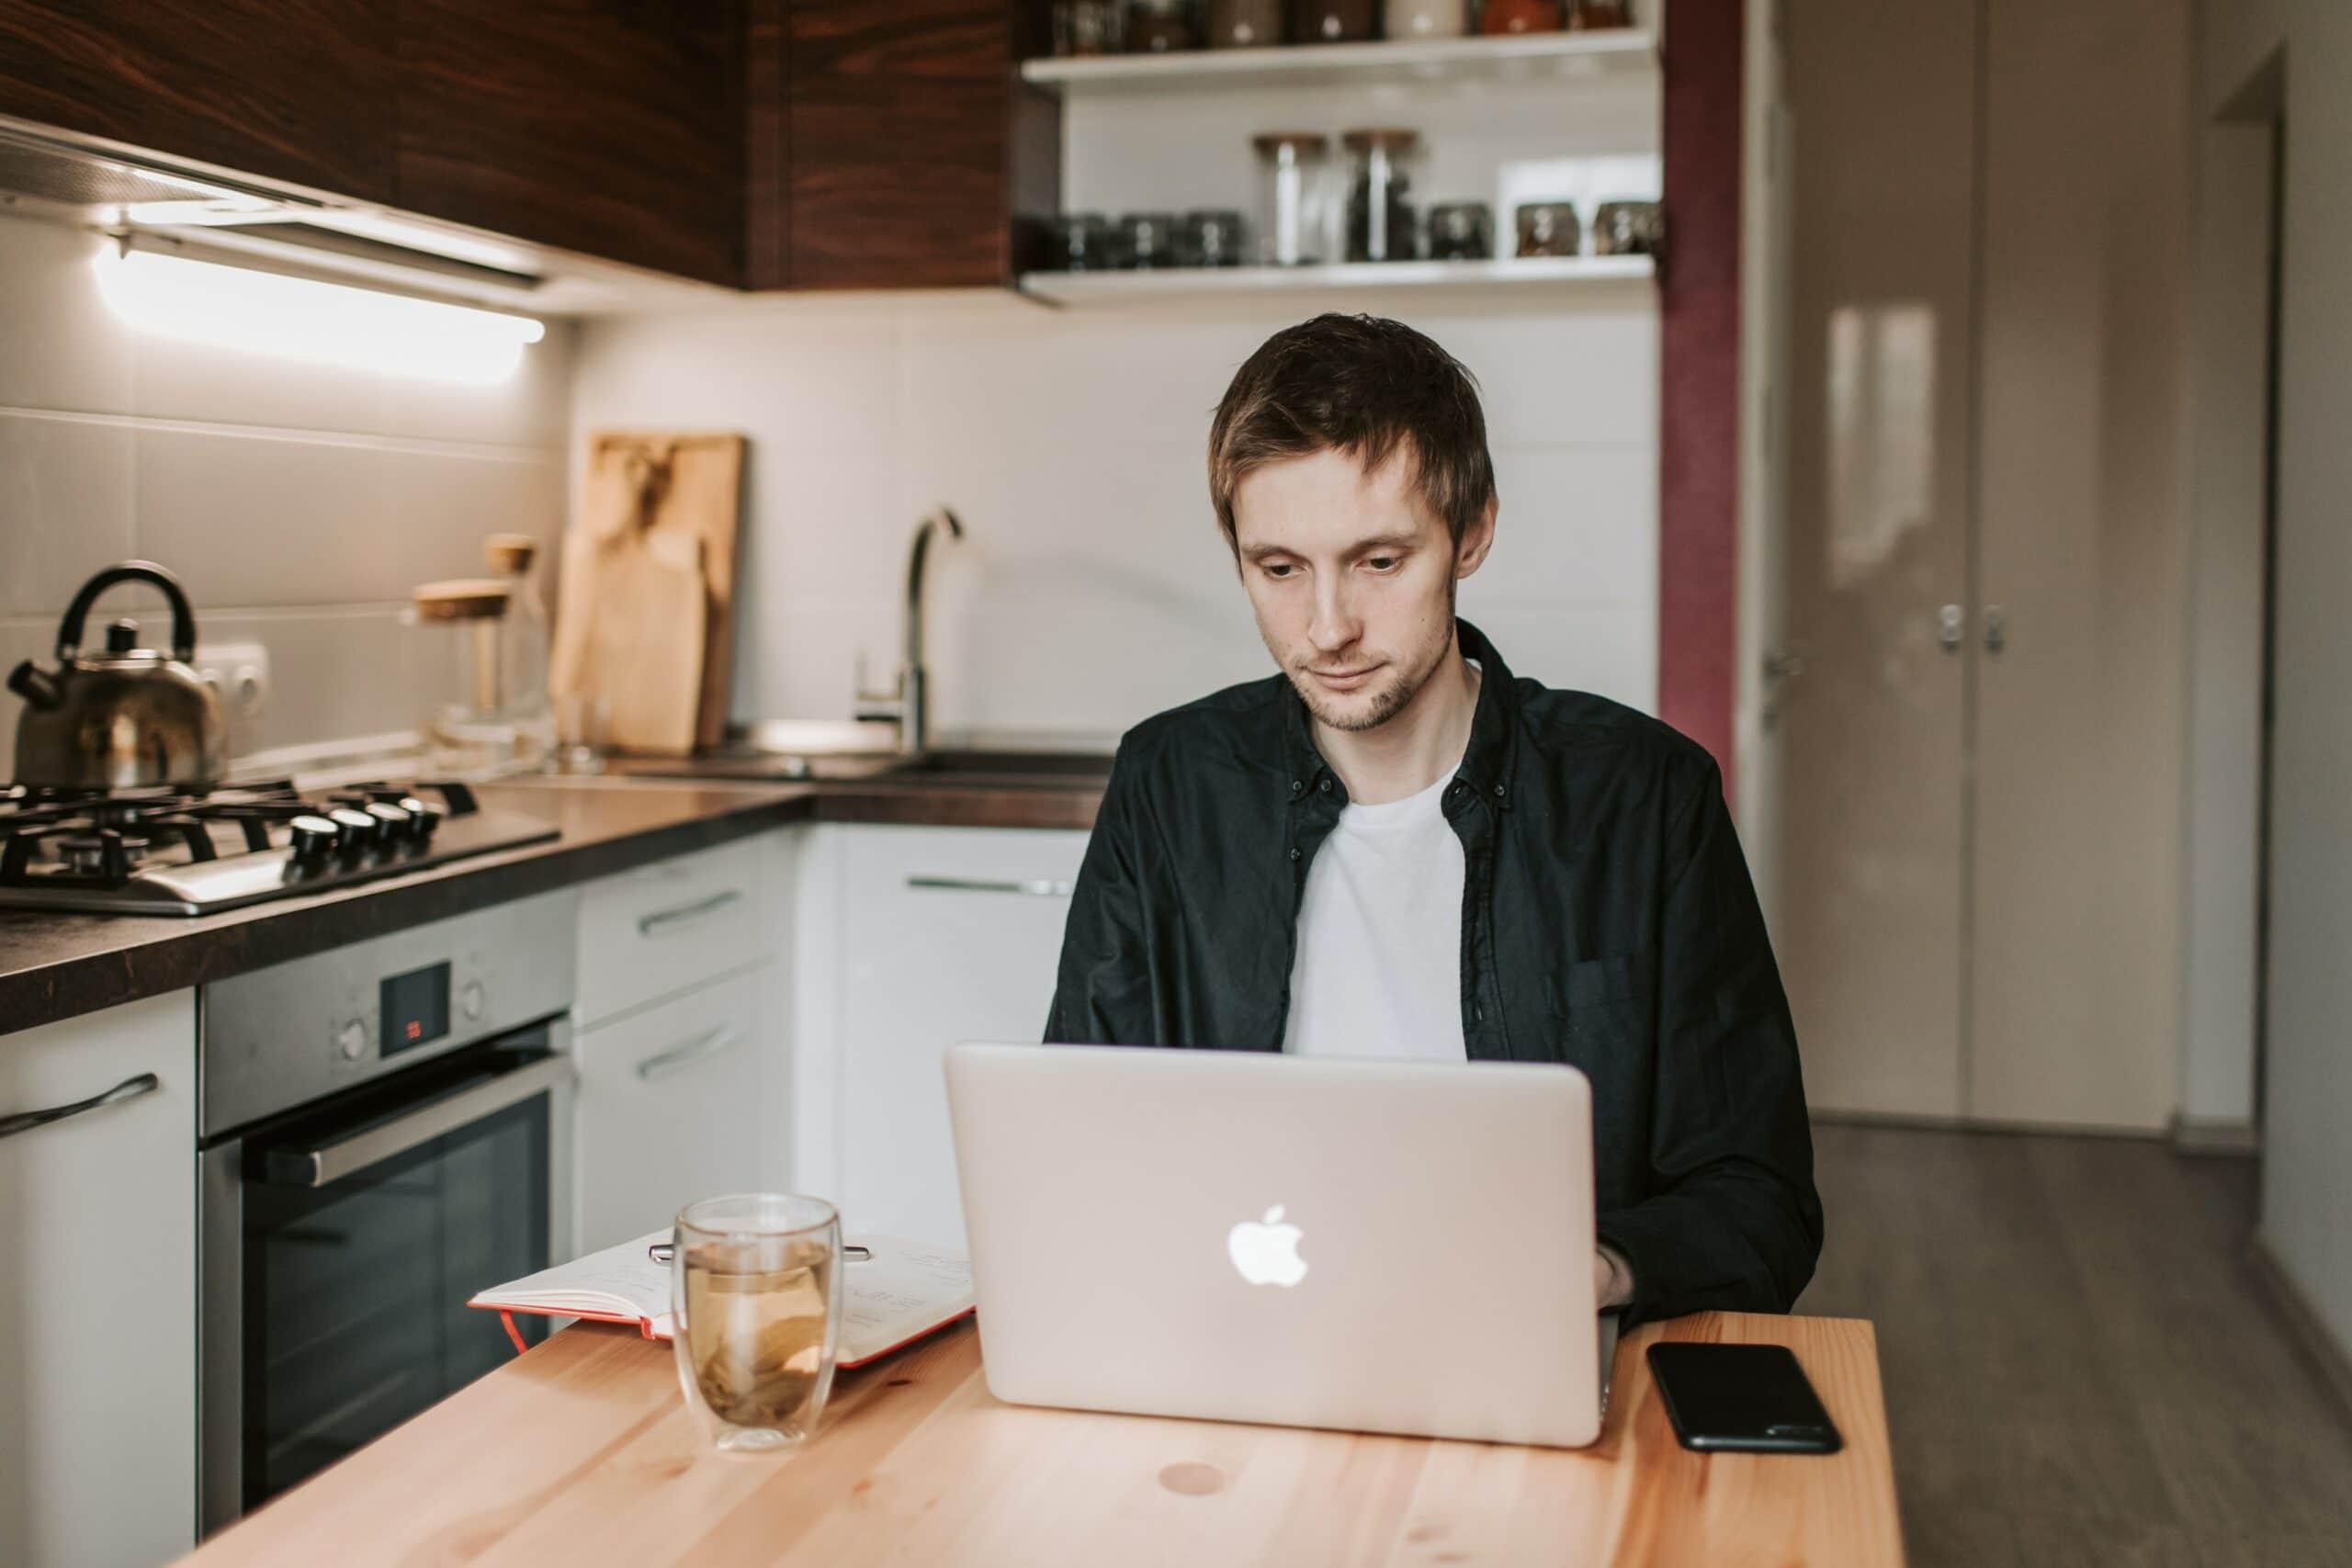 How do I achieve A perfect Work Life Balance?